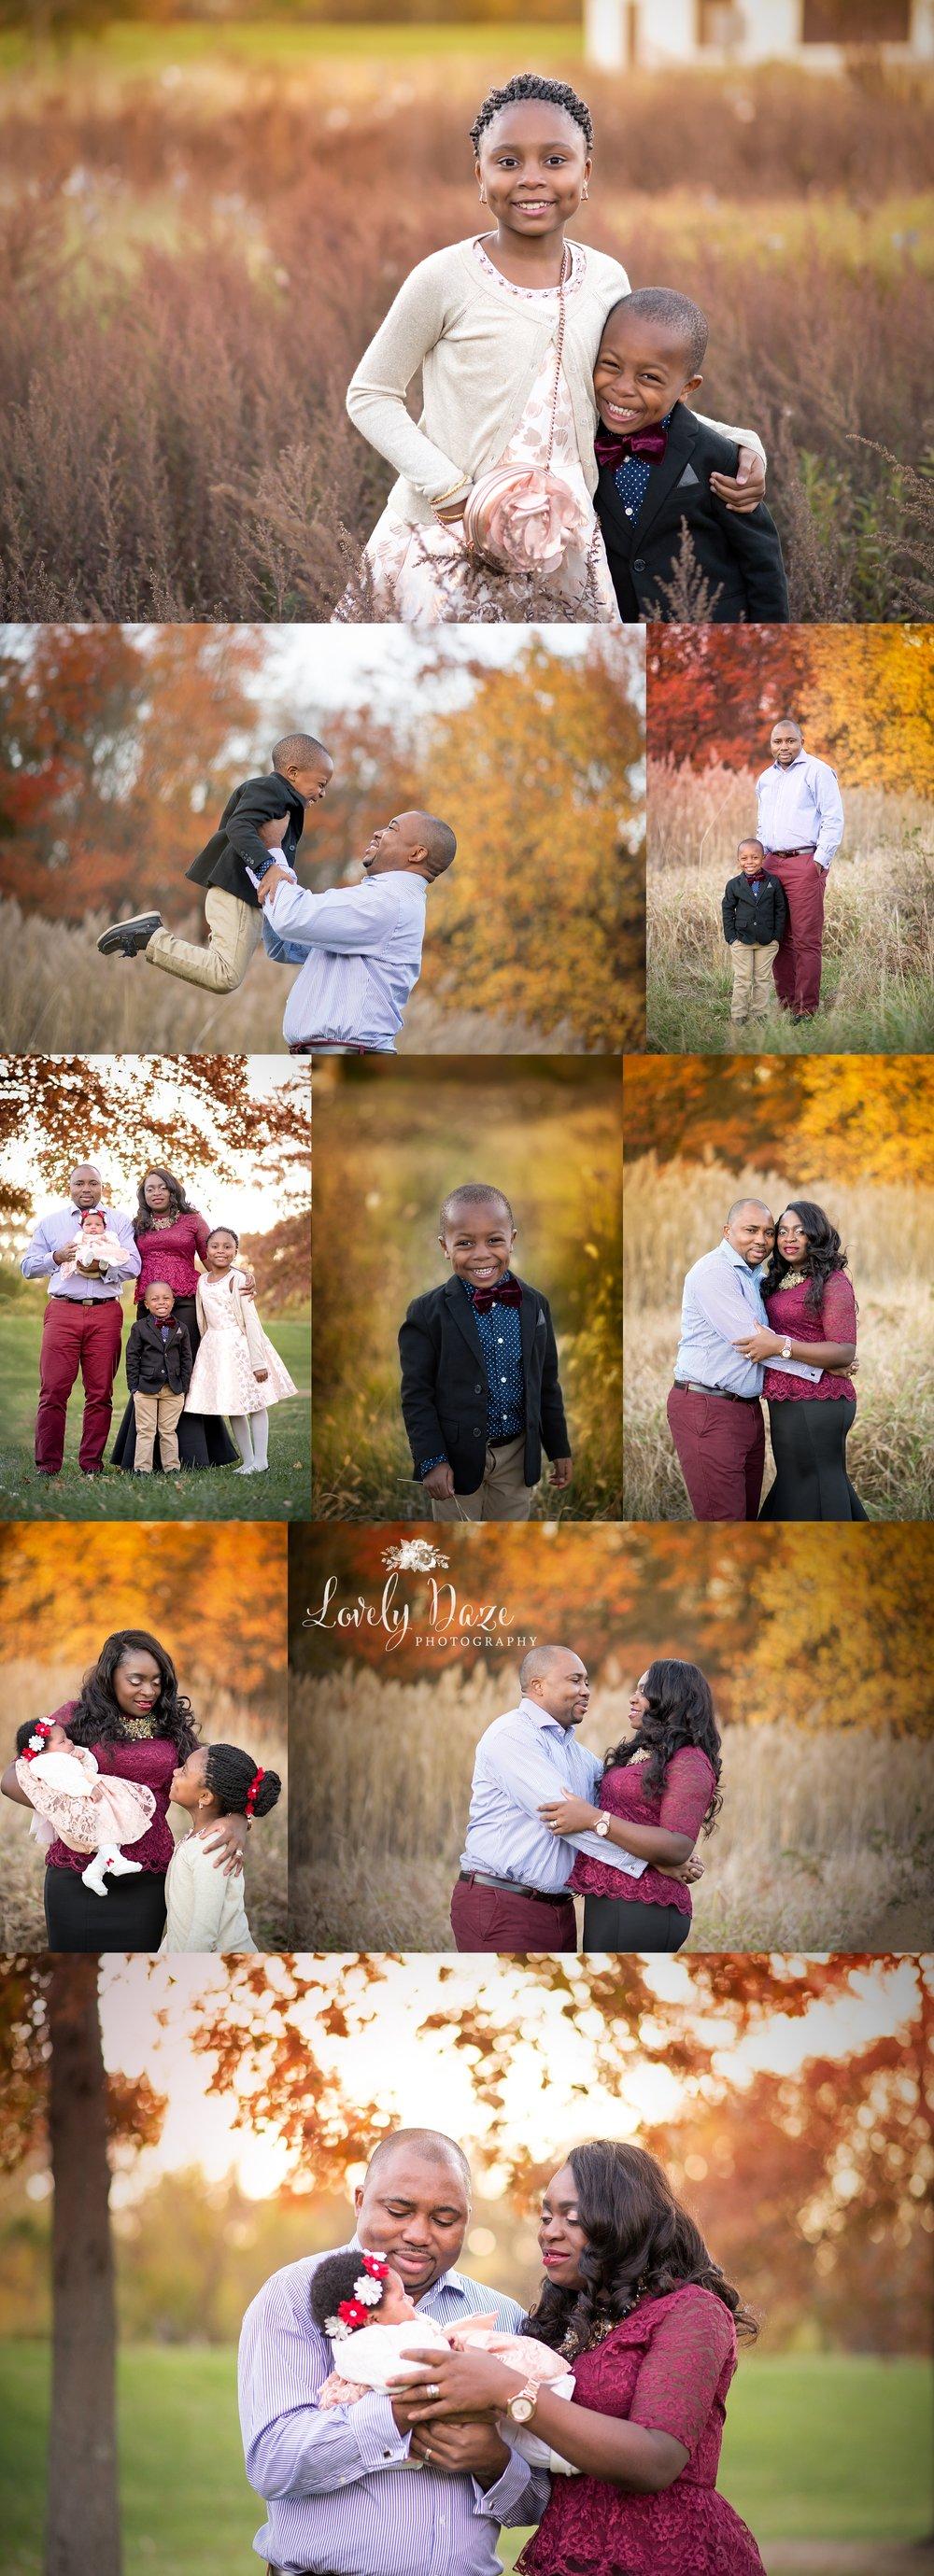 Union nj family portrait photographer.jpg